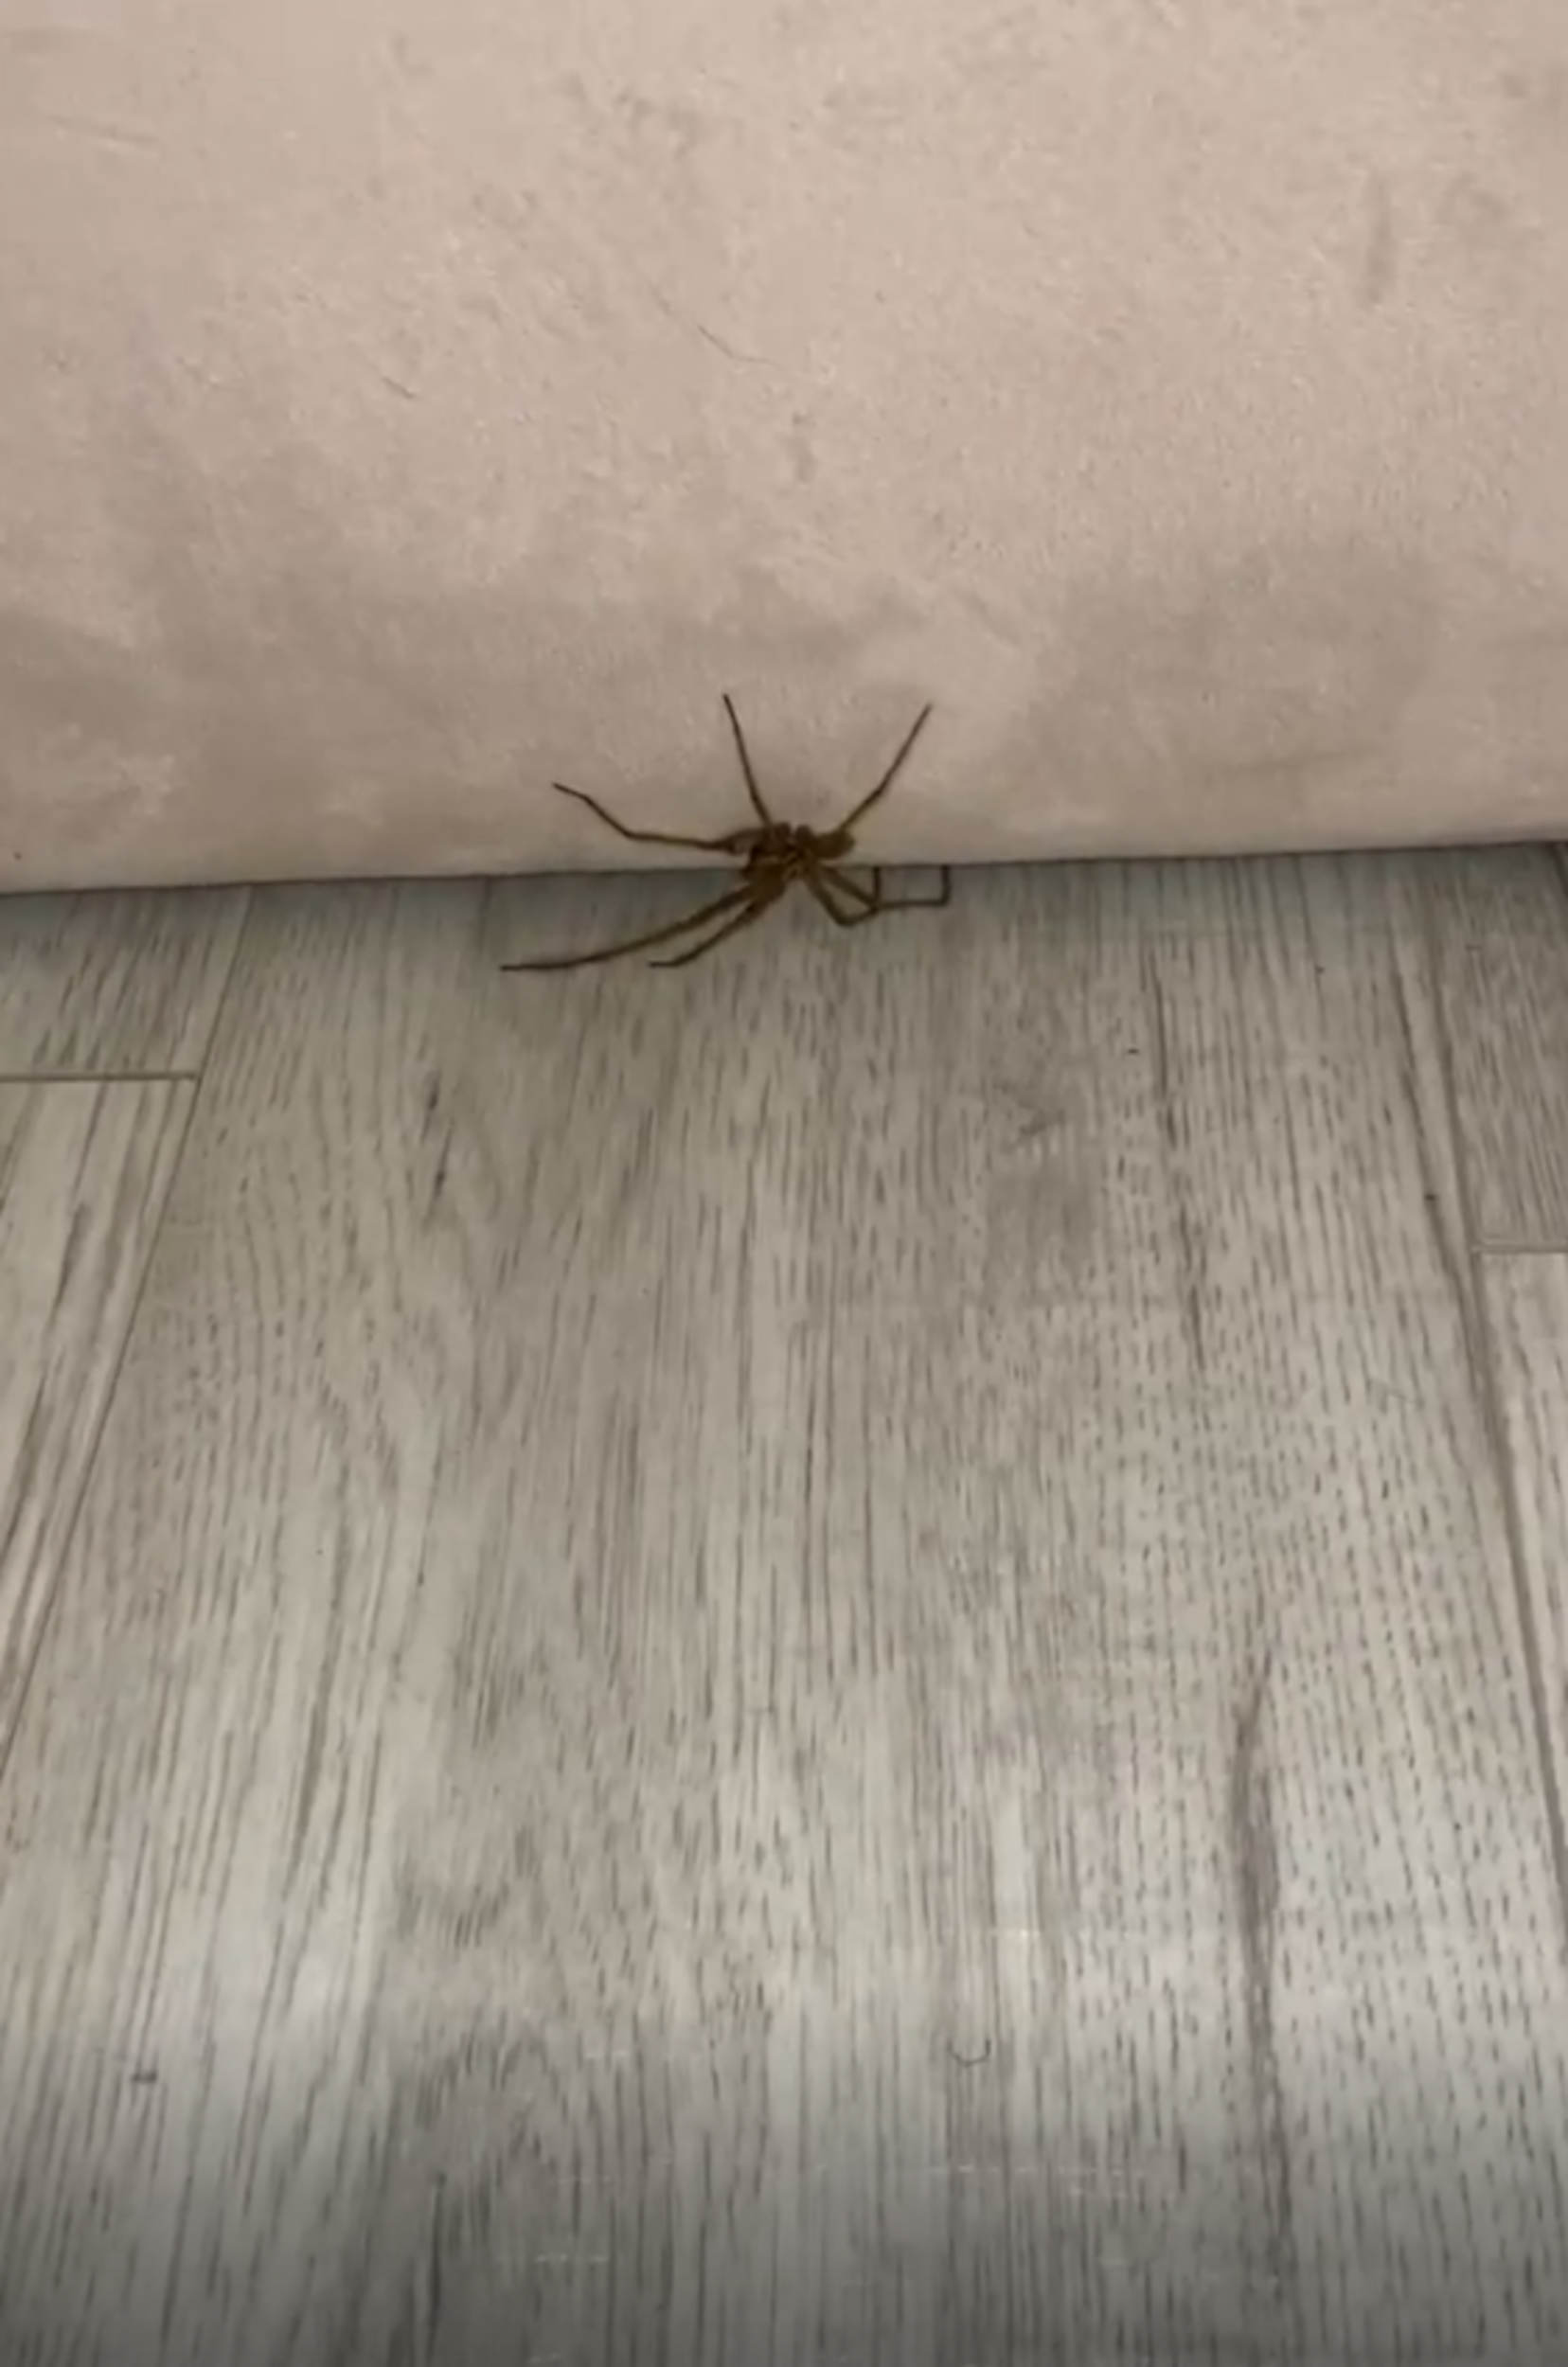 The giant spider - Animal News UK